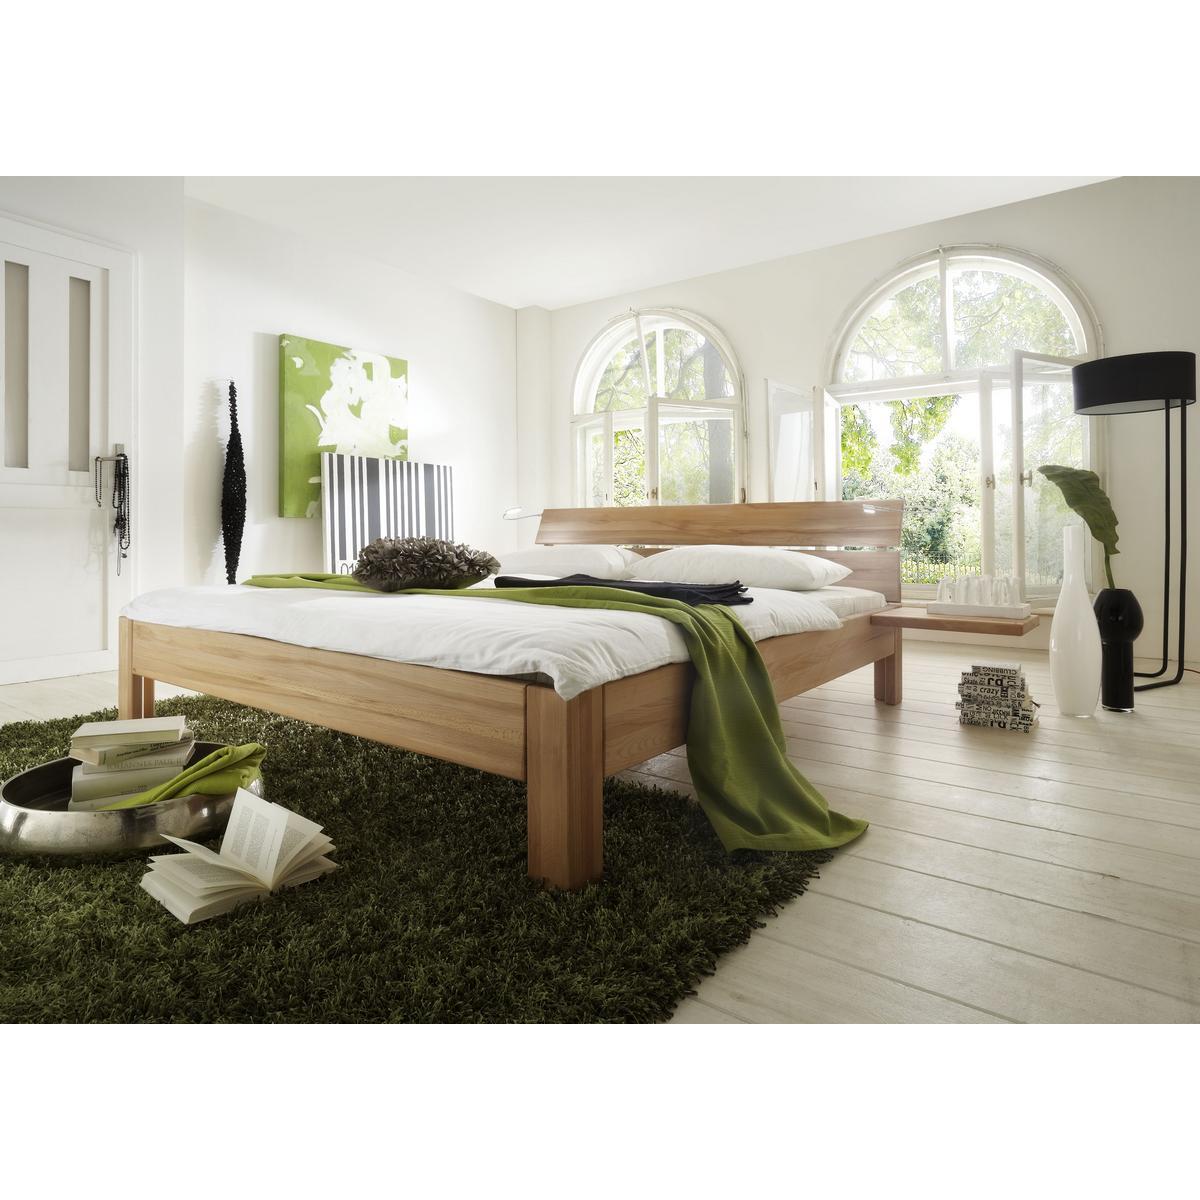 massivholz bett 120x200 xl easy sleep kernbuche massiv ge lt 9212 93 87. Black Bedroom Furniture Sets. Home Design Ideas